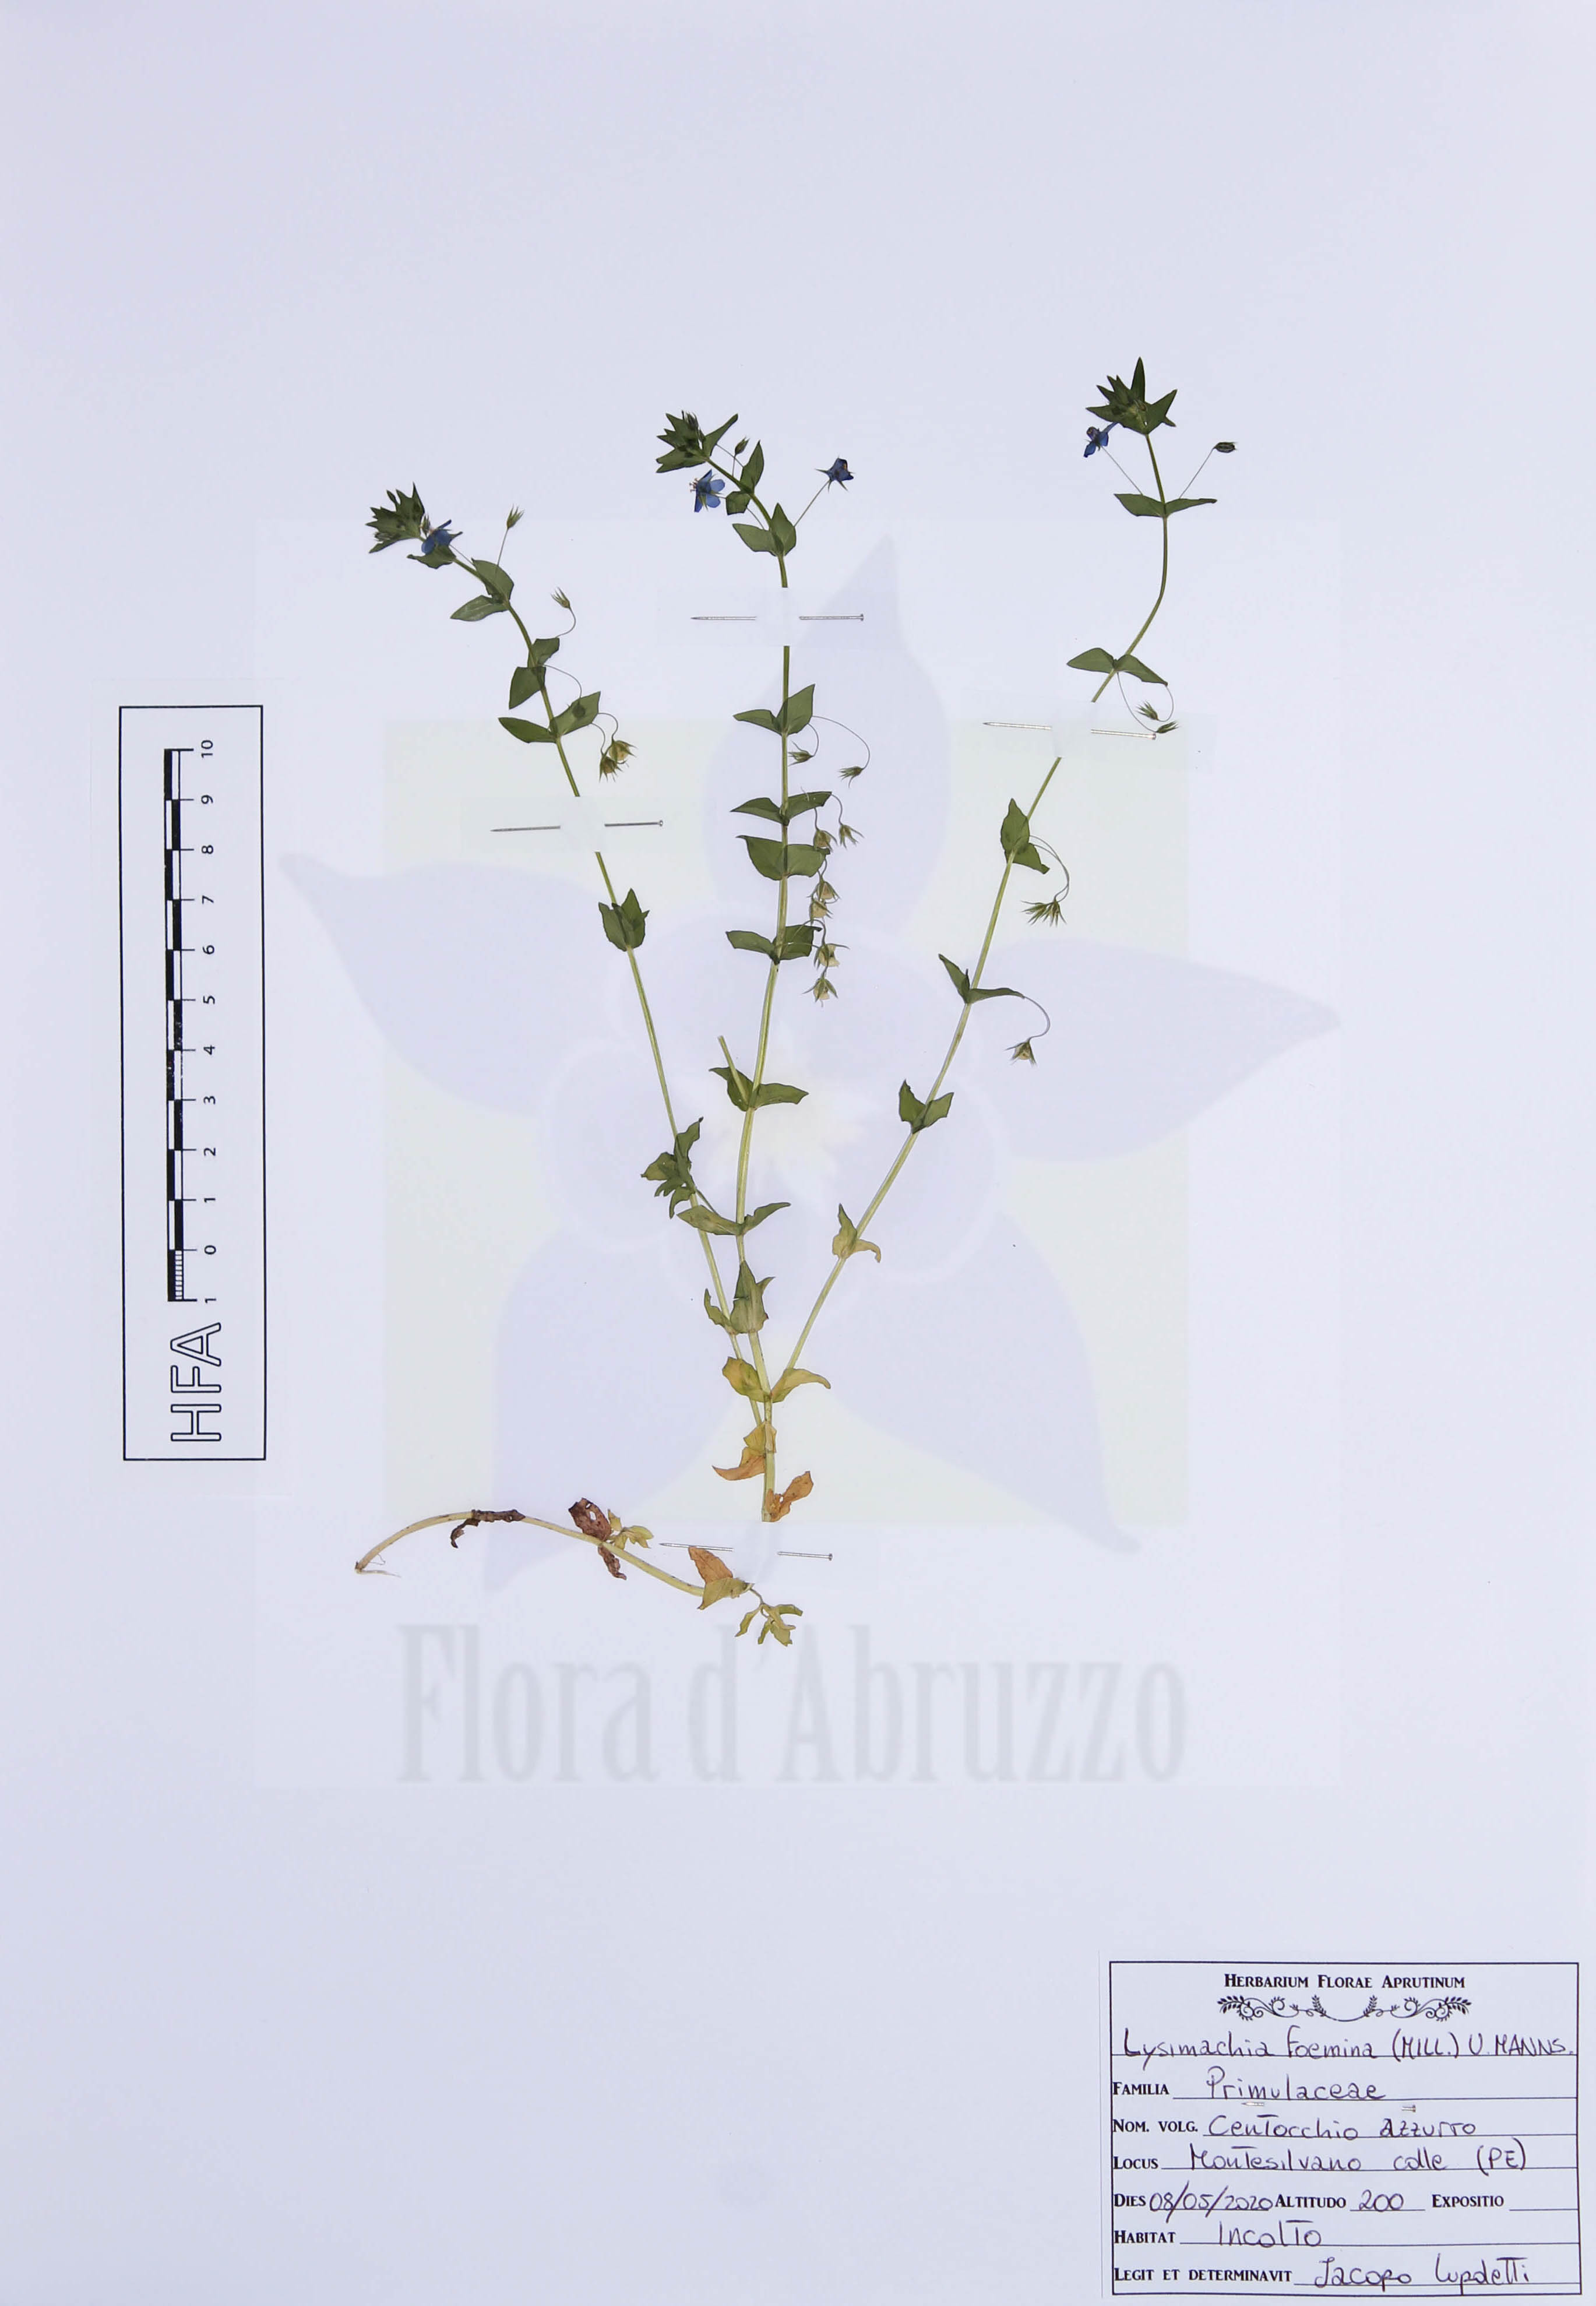 Lysimachia foemina(Mill.) U. Manns & Anderb.